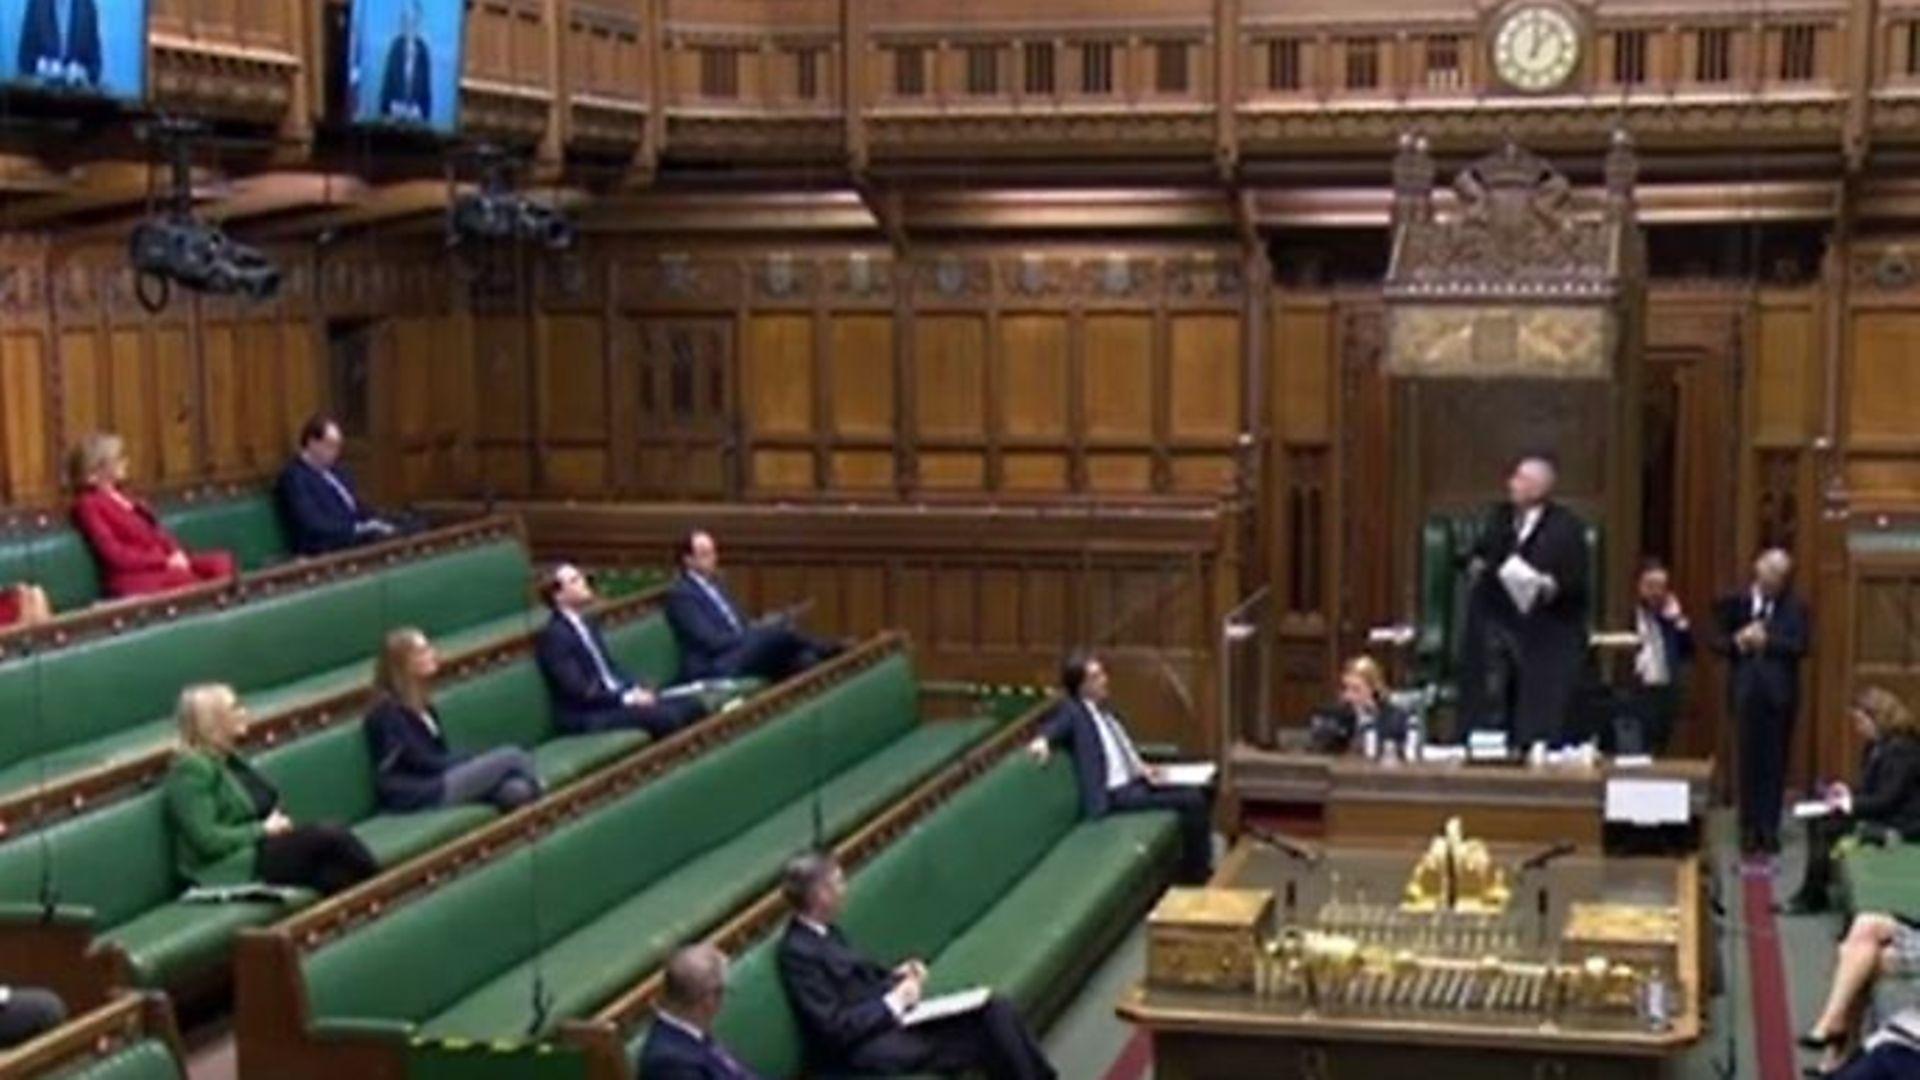 Parliament during PMQs - Credit: Parliamentlive.tv